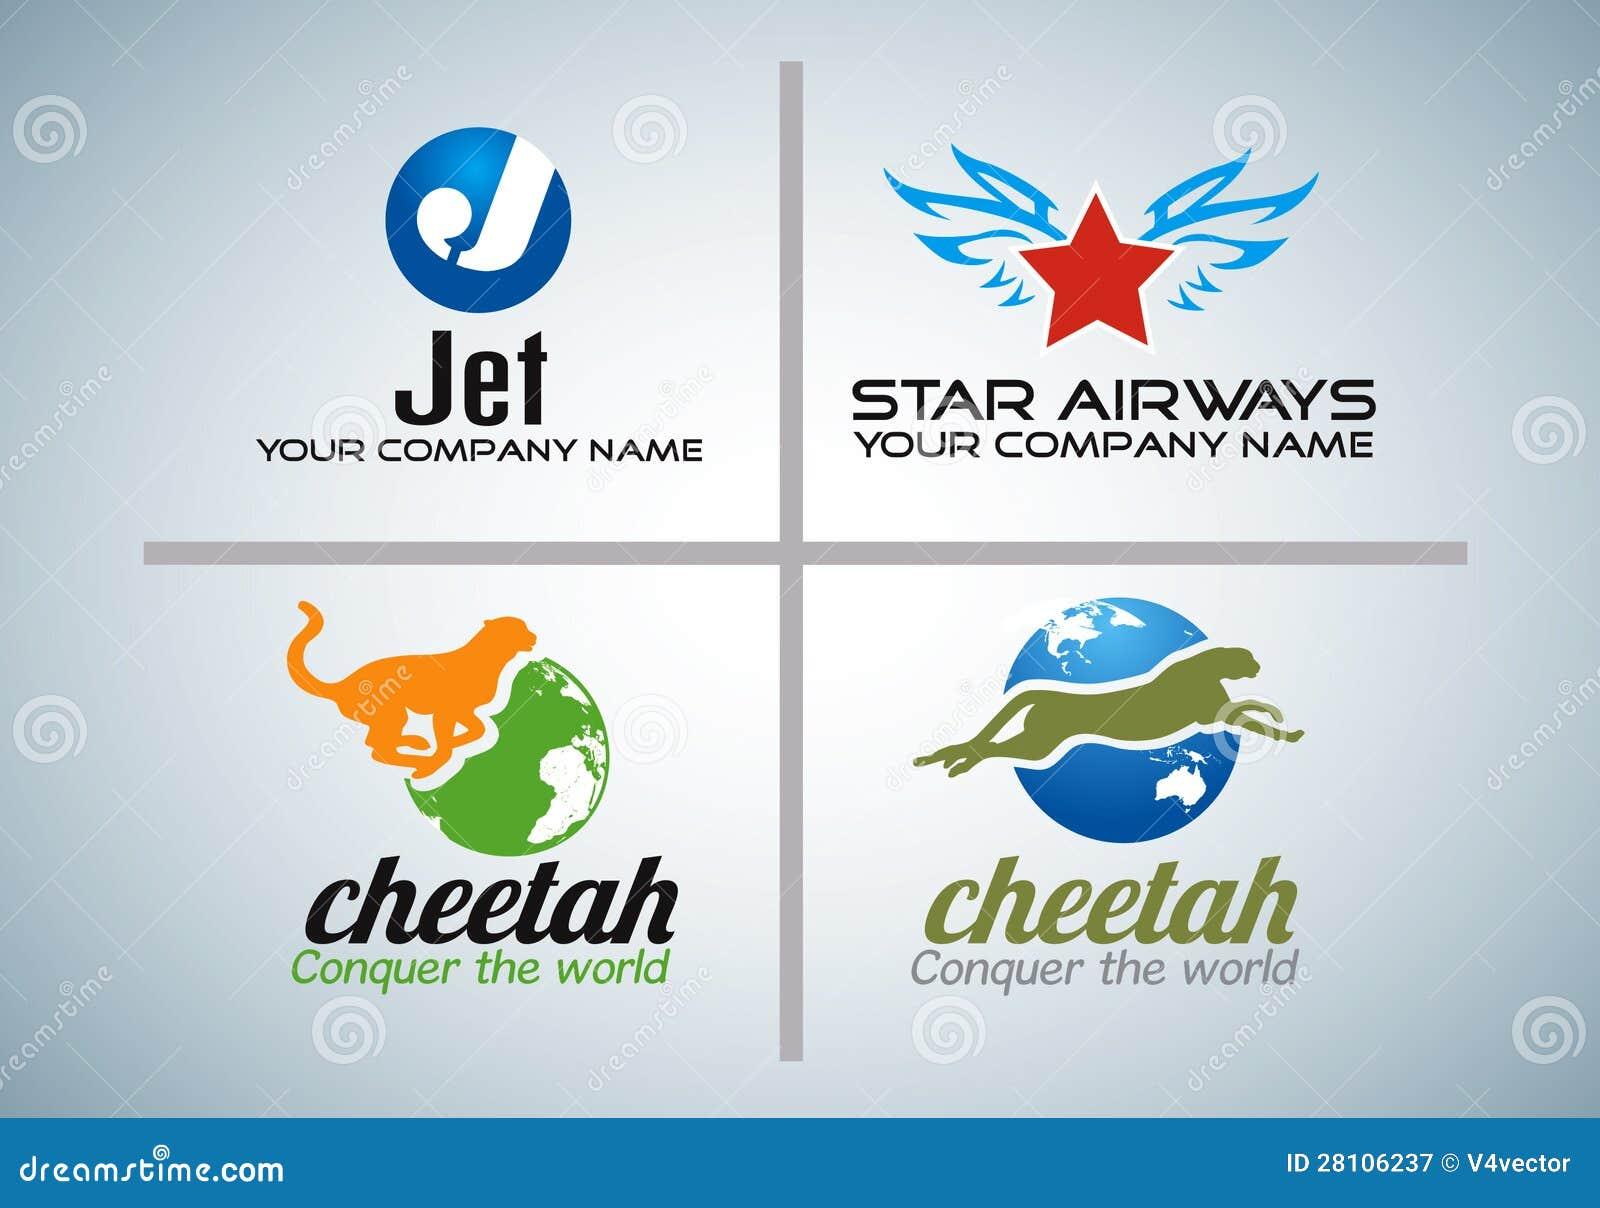 Innovative logo design royalty free stock photography for Innovative design company